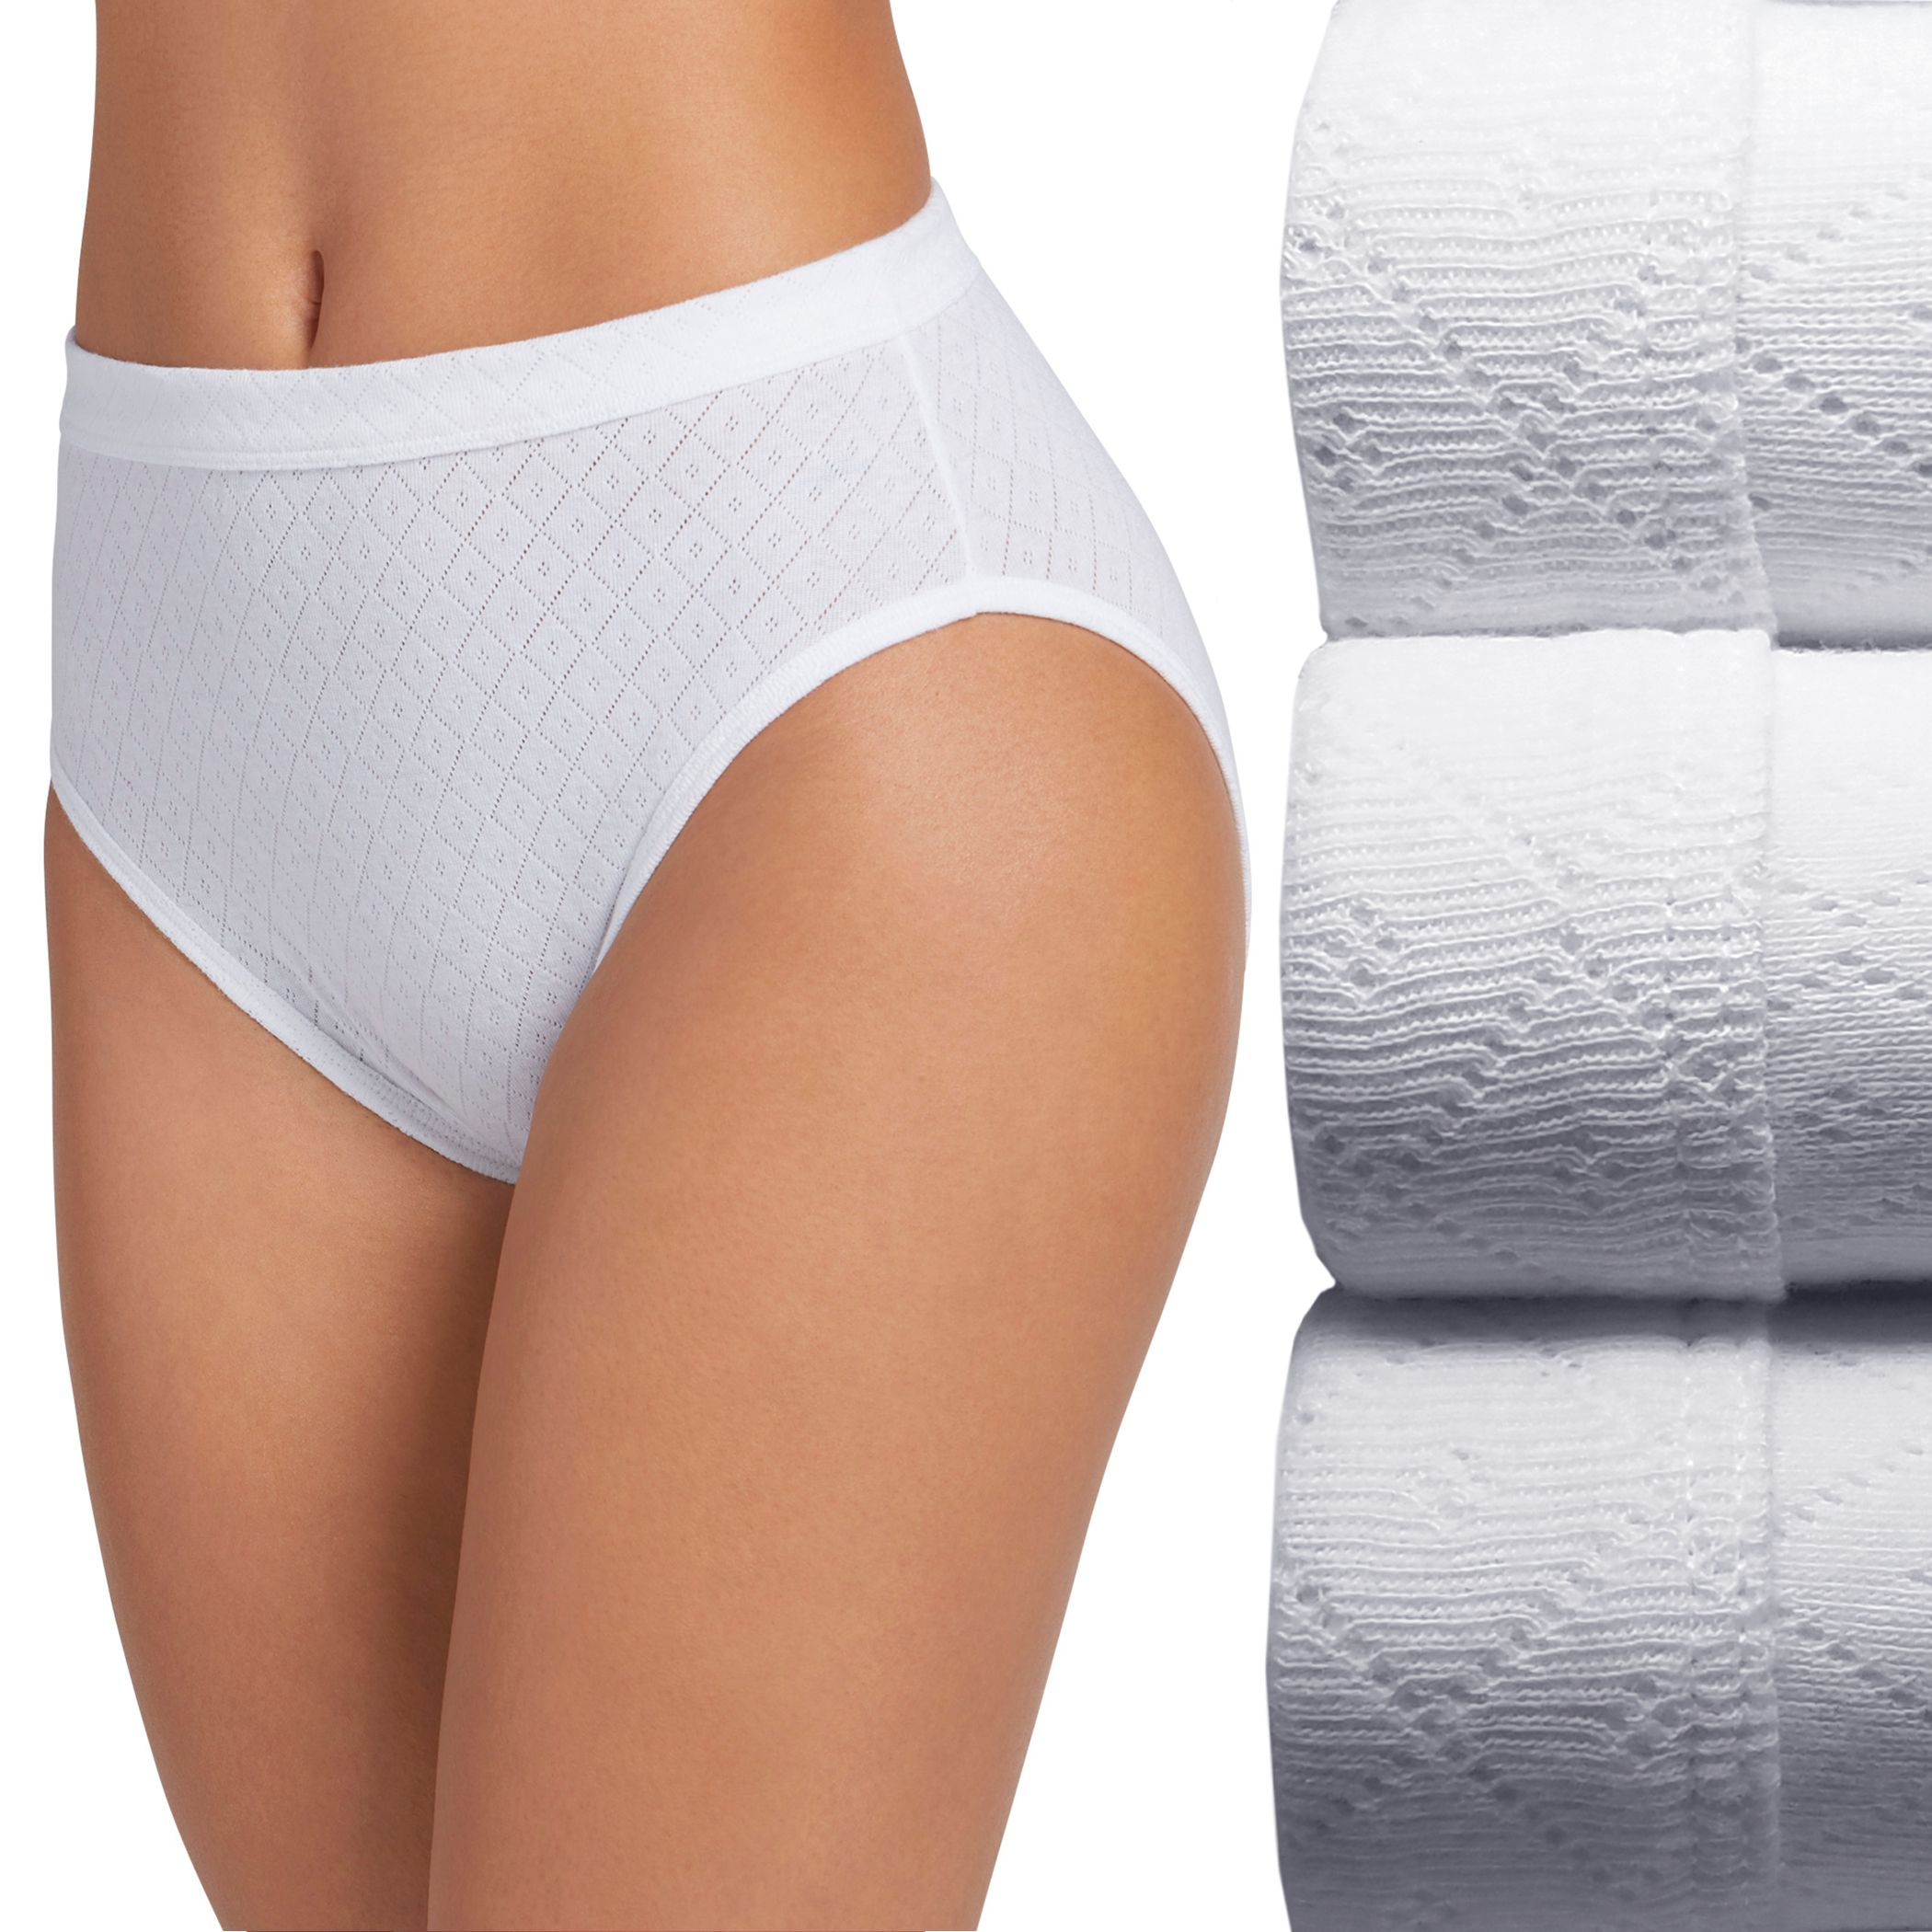 French cut panties